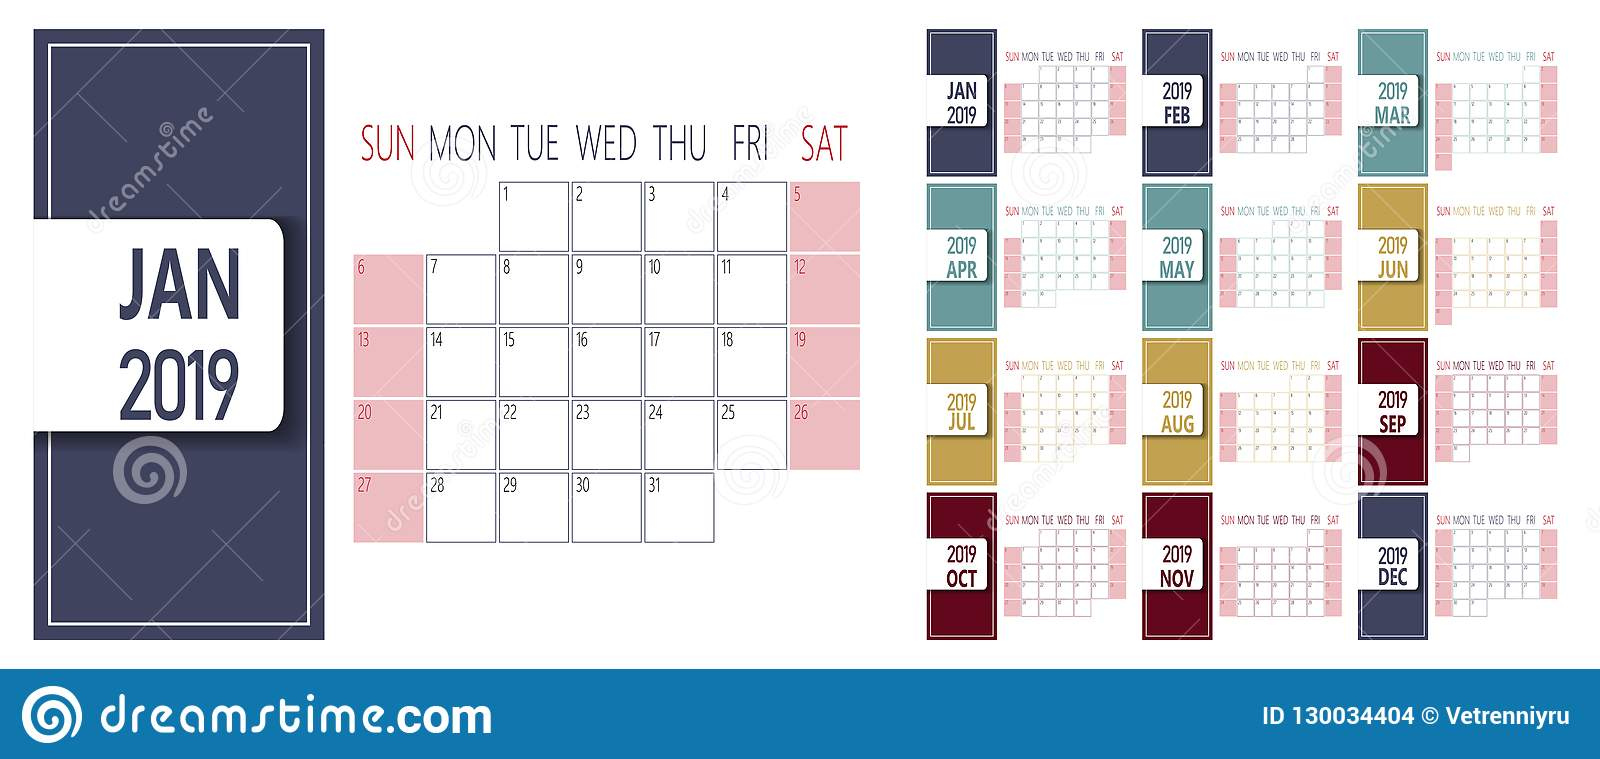 Simple 2019 new year calendar template. Week starts on Sunday